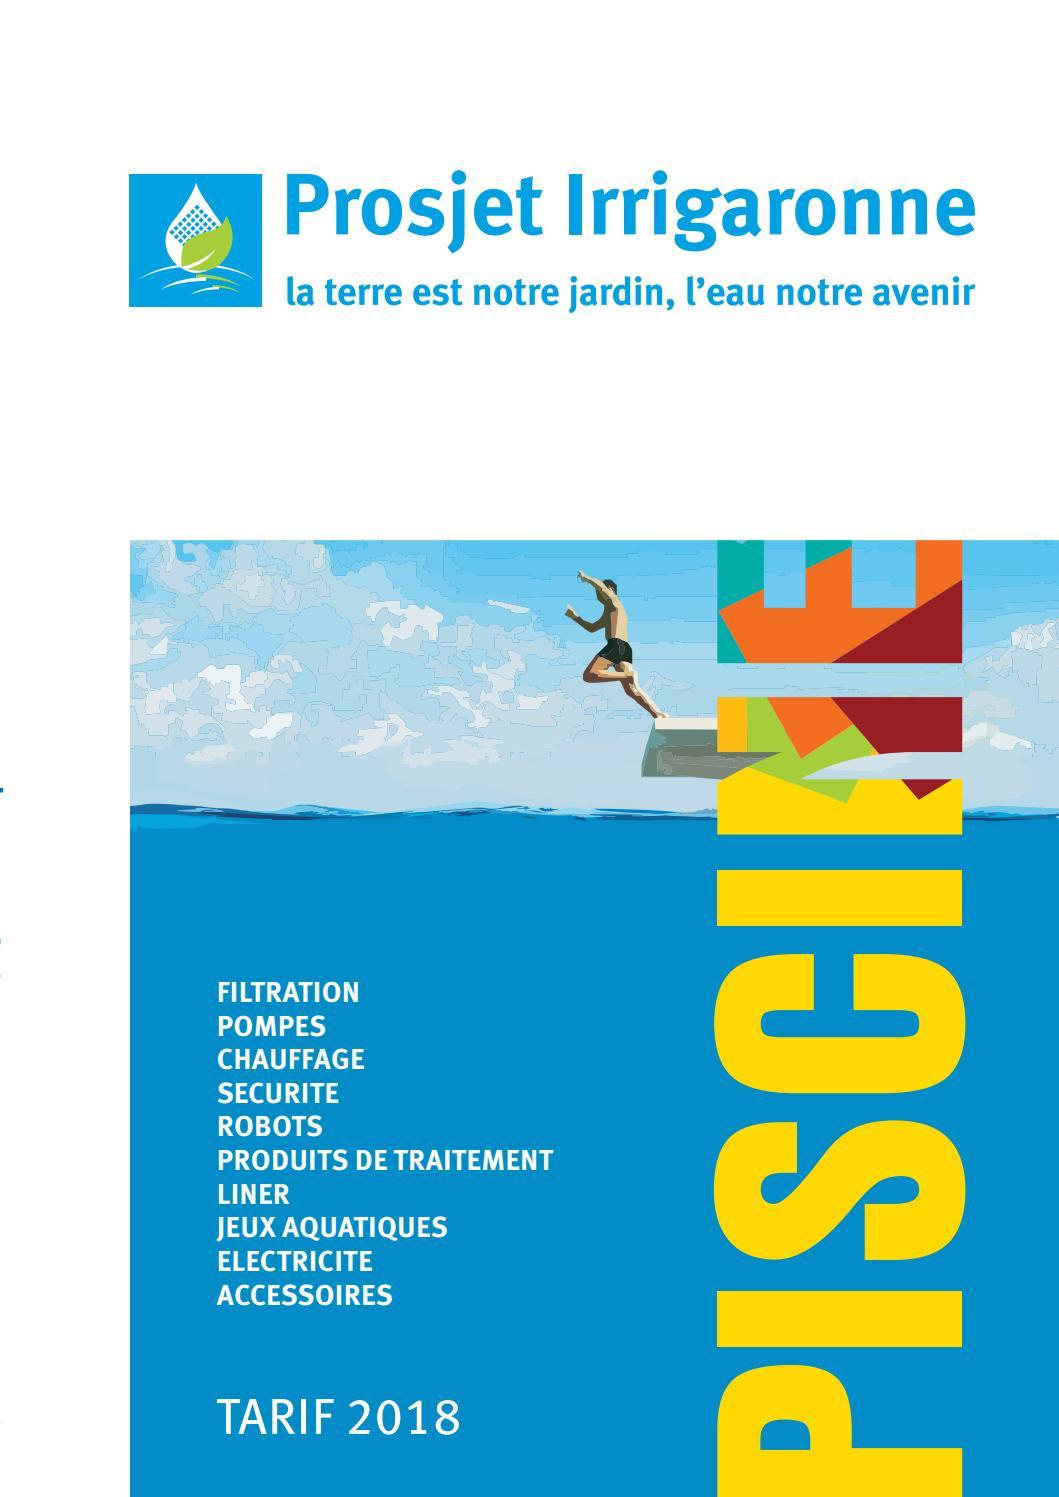 Prosjet Irrigaronne Piscine 2018 By Prosjetirrigaronne - Issuu intérieur Colmateur De Fuite Piscine